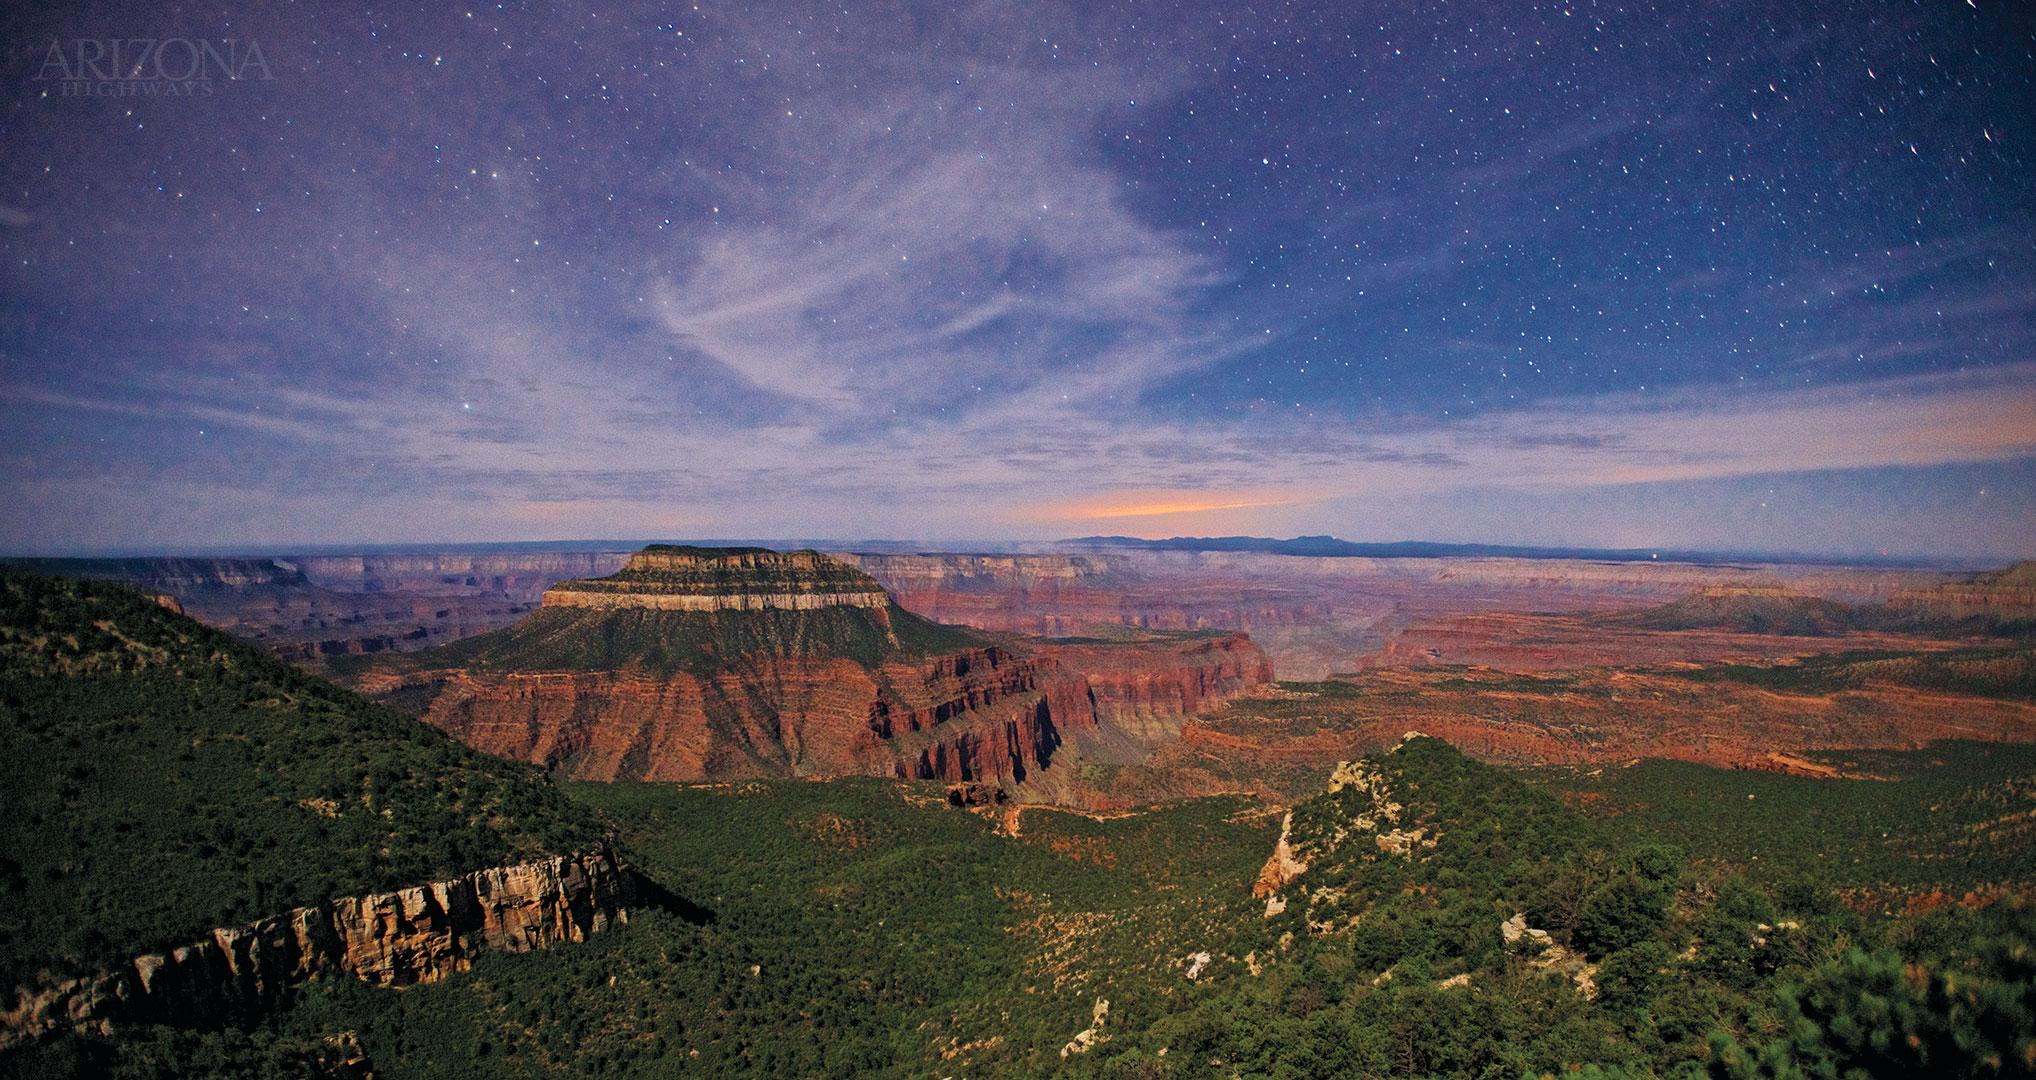 Shane McDermott/Arizona Highways